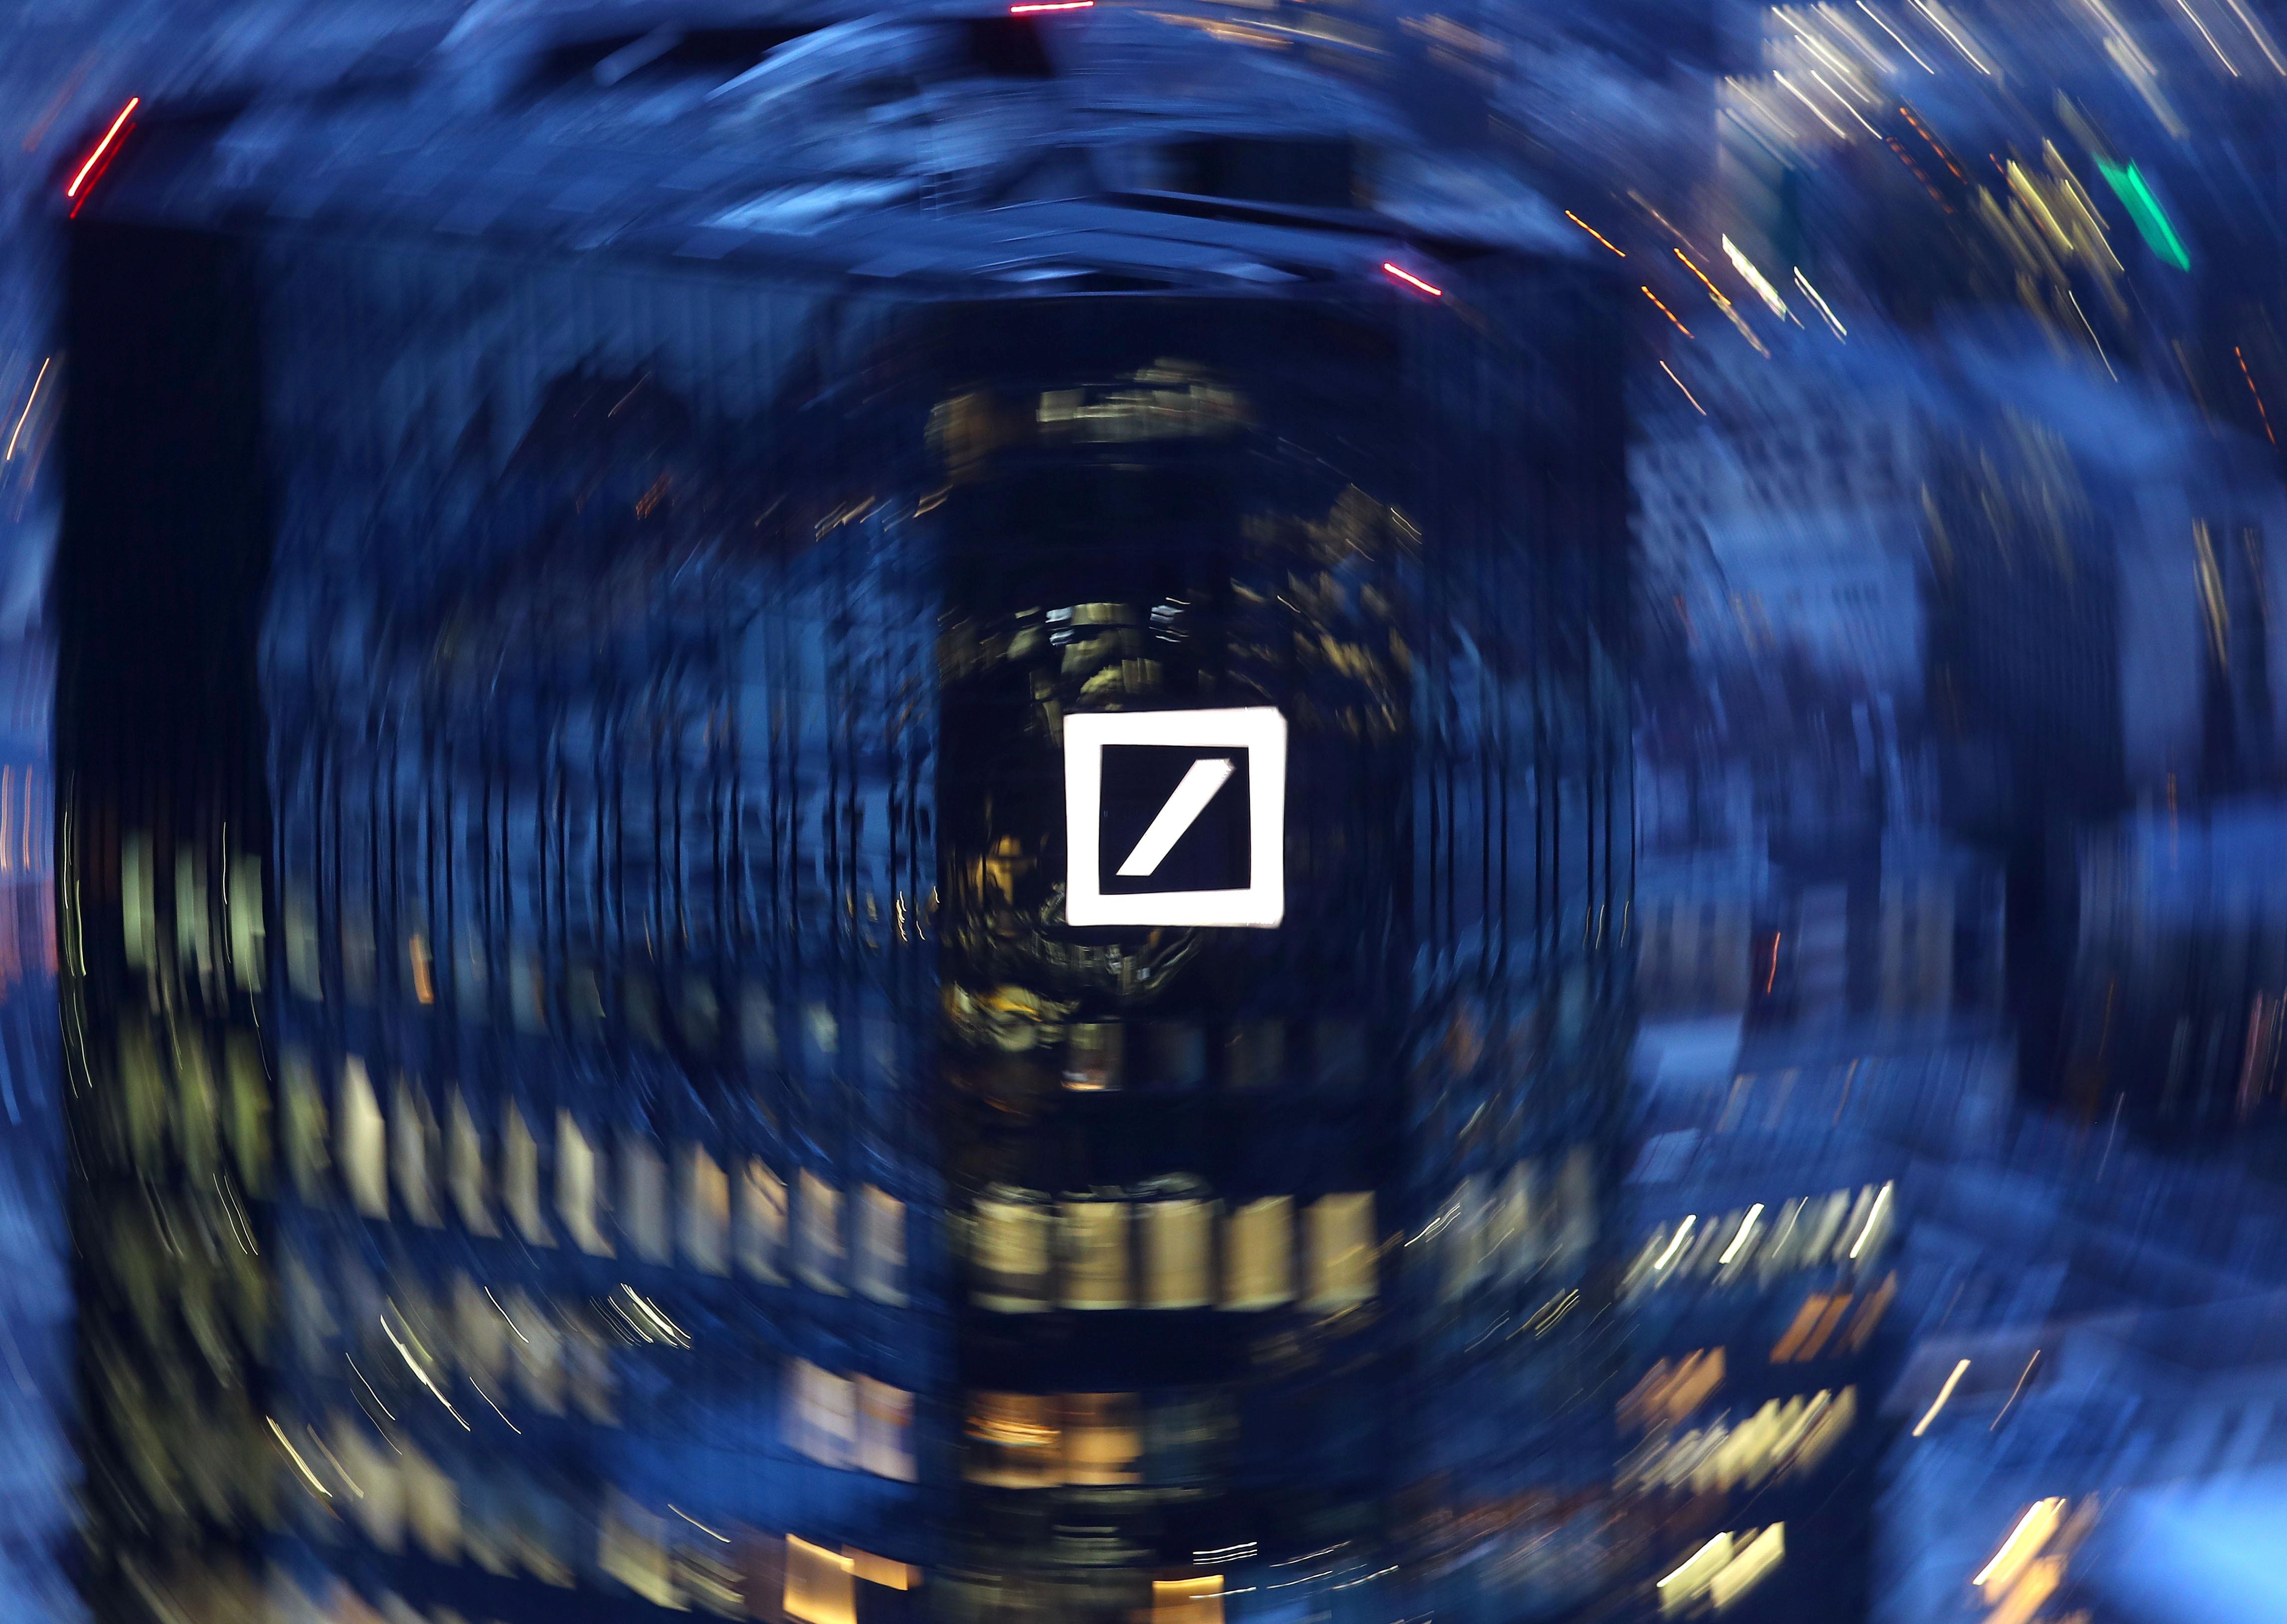 Deutsche Bank suffers renewed loss on legal costs